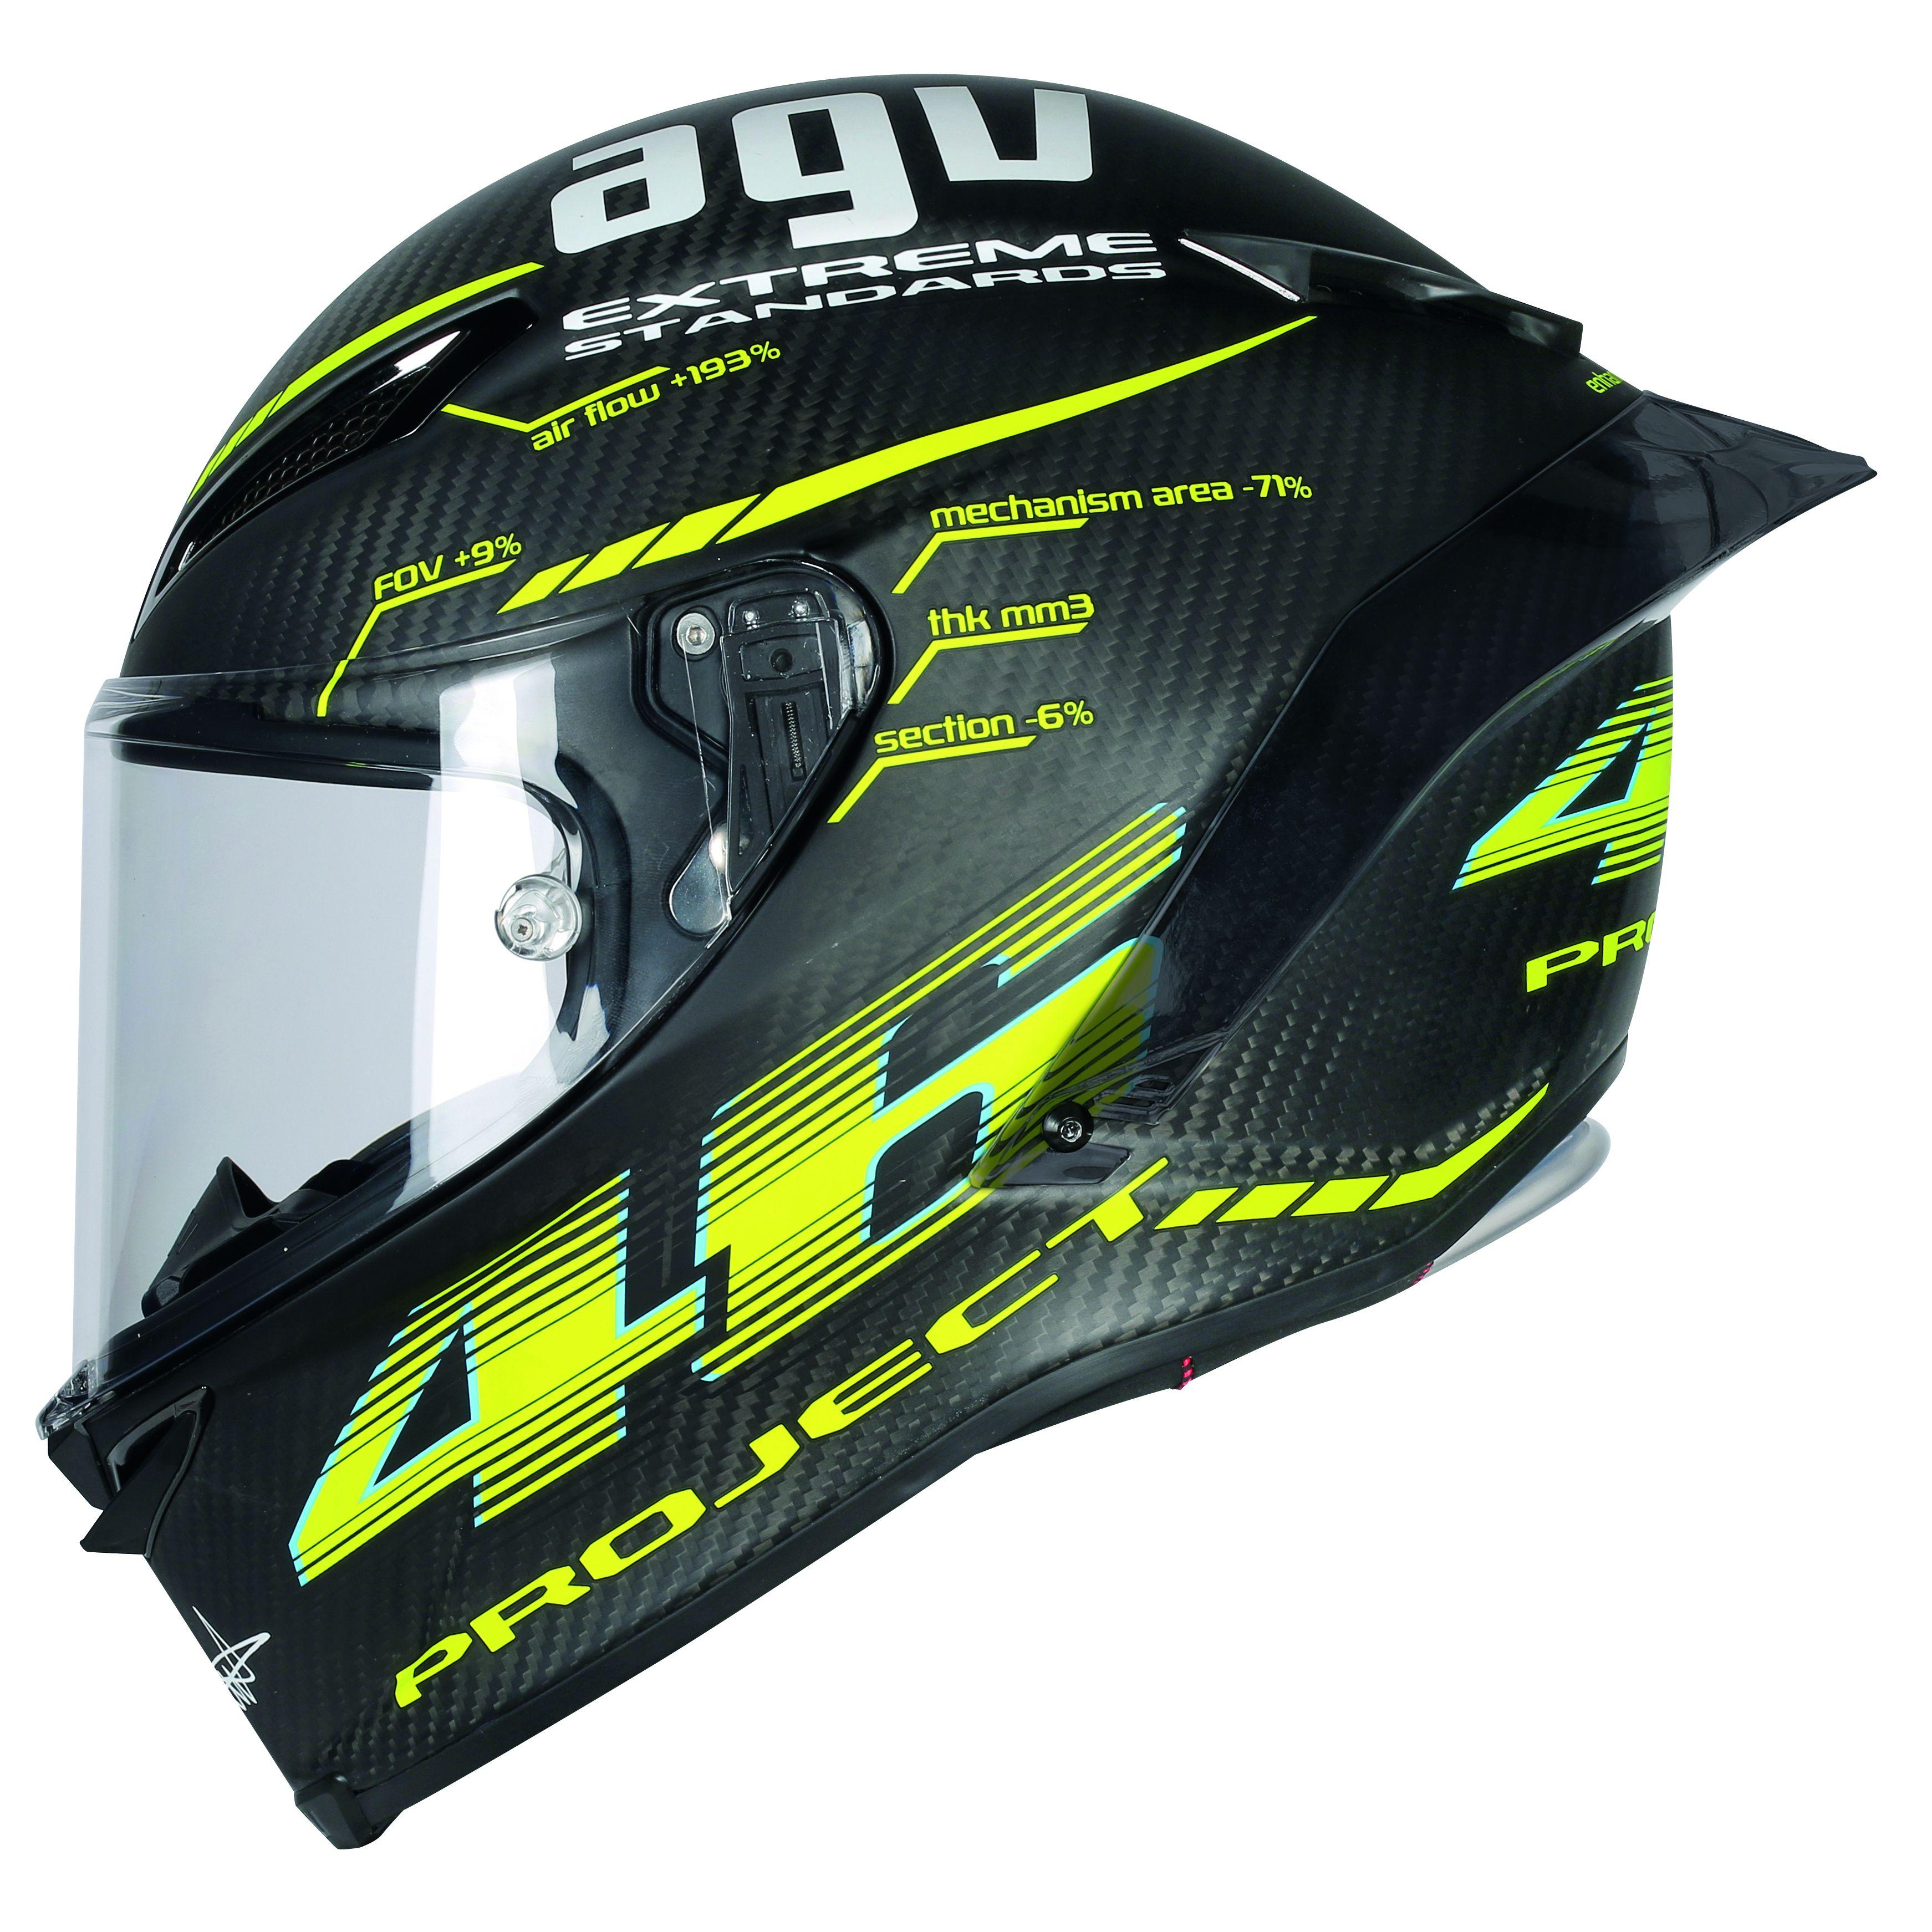 AGV Pista GP Top Project 46 2.0 Helmet - LSH Racing World